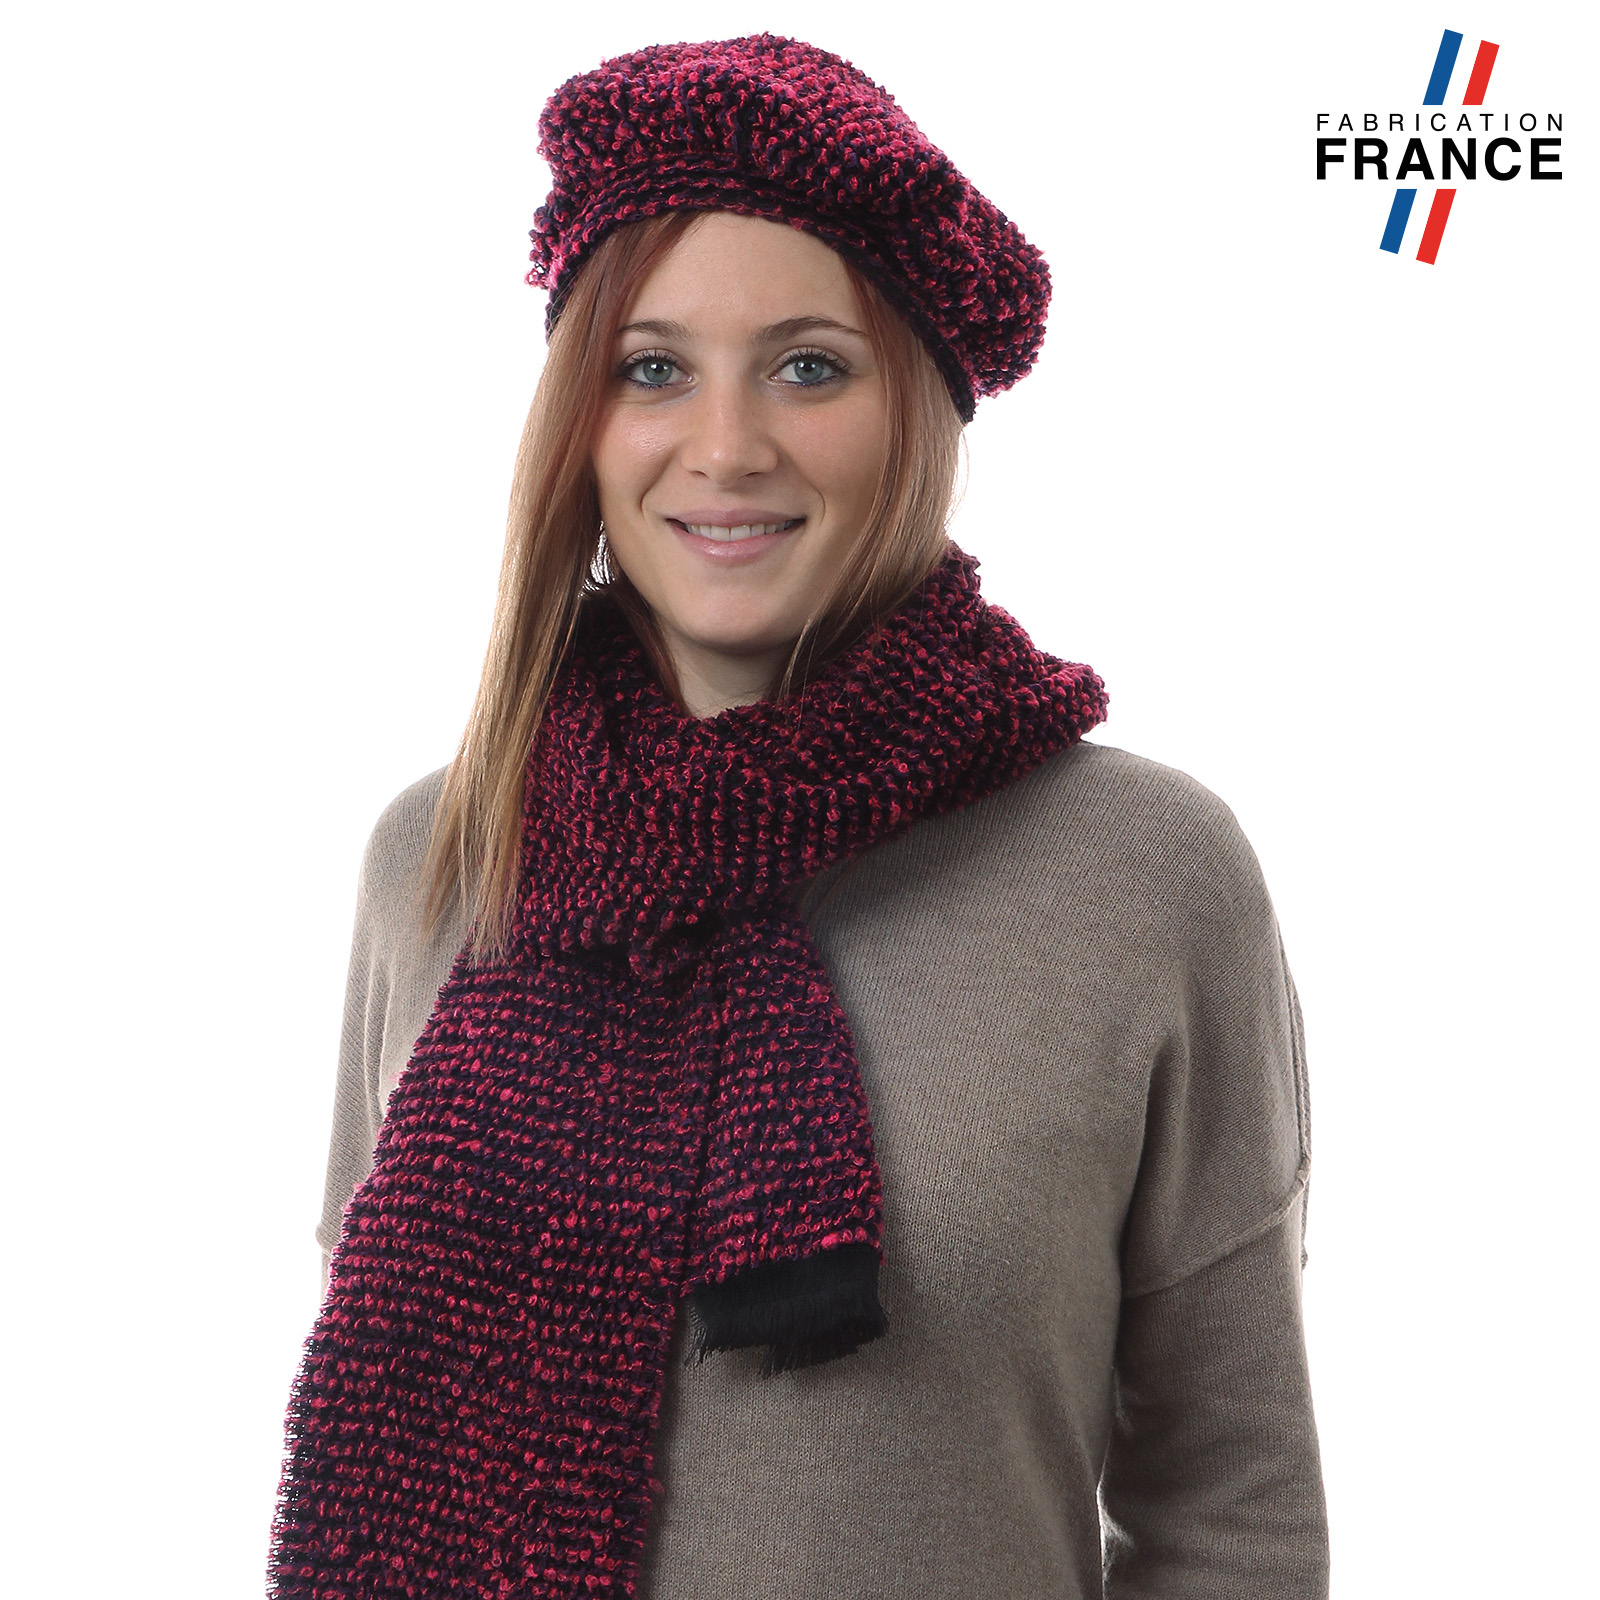 AT-03500-V16-echarpe-beret-fuchsia-fabrication-francaise